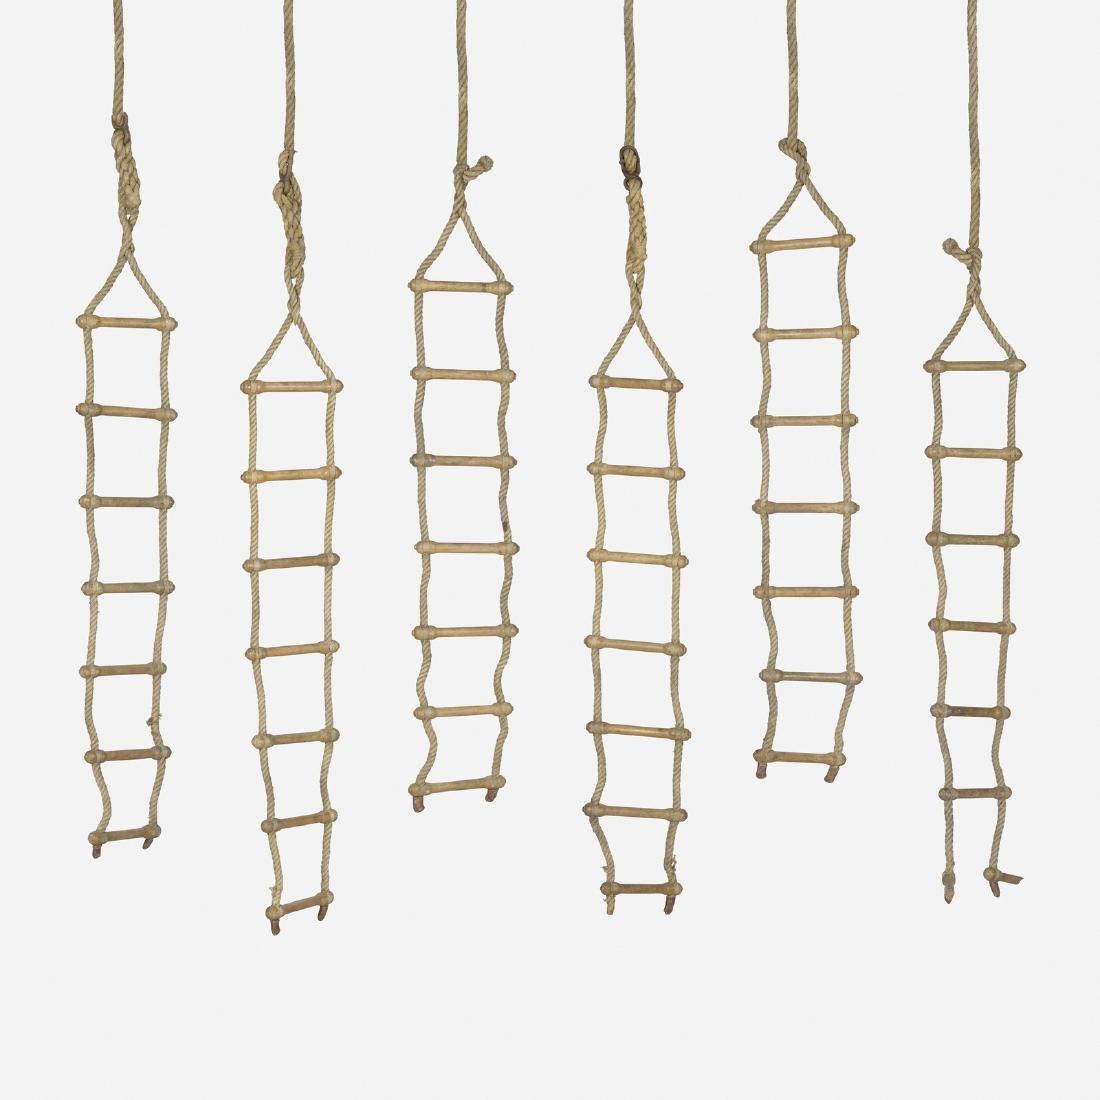 Czechoslovakian, rope ladders, set of six